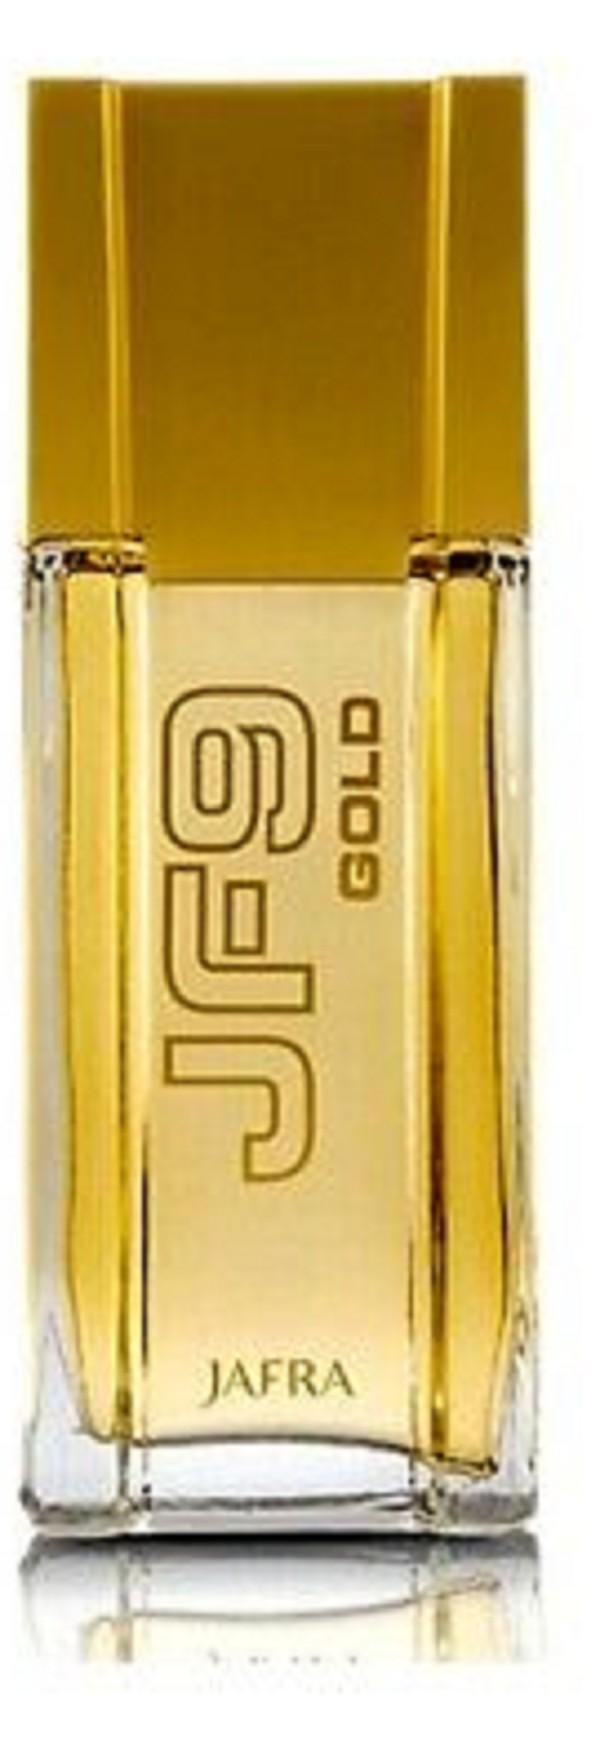 Foto4 - Perfume Importado JF9 Gold Masculino Original Jafra - 100ML